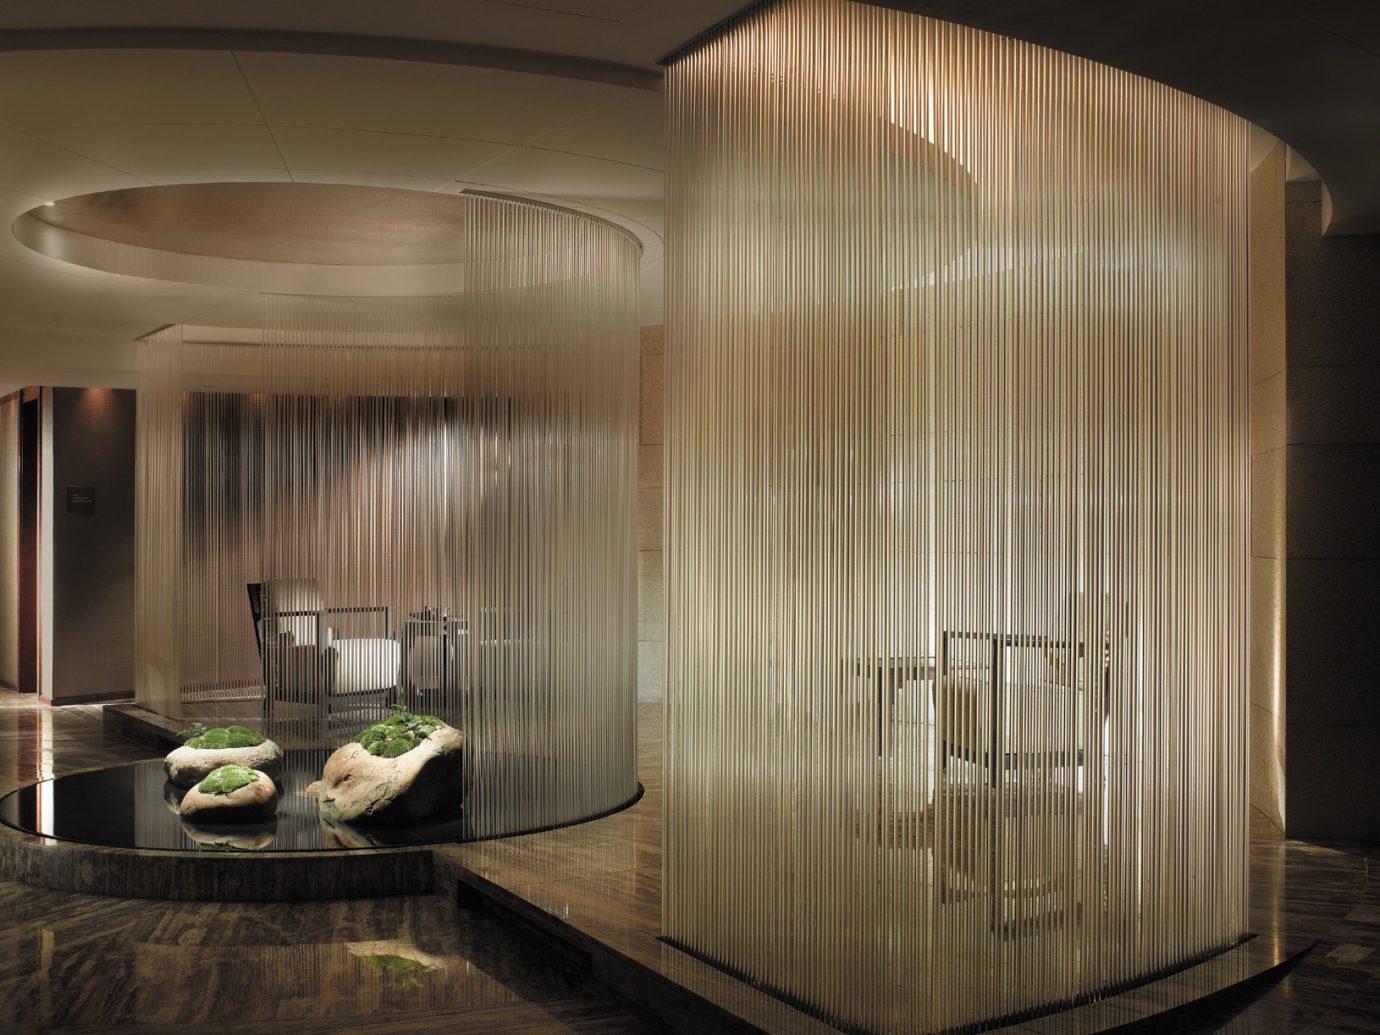 Hotels indoor ceiling room interior design lighting Design window covering